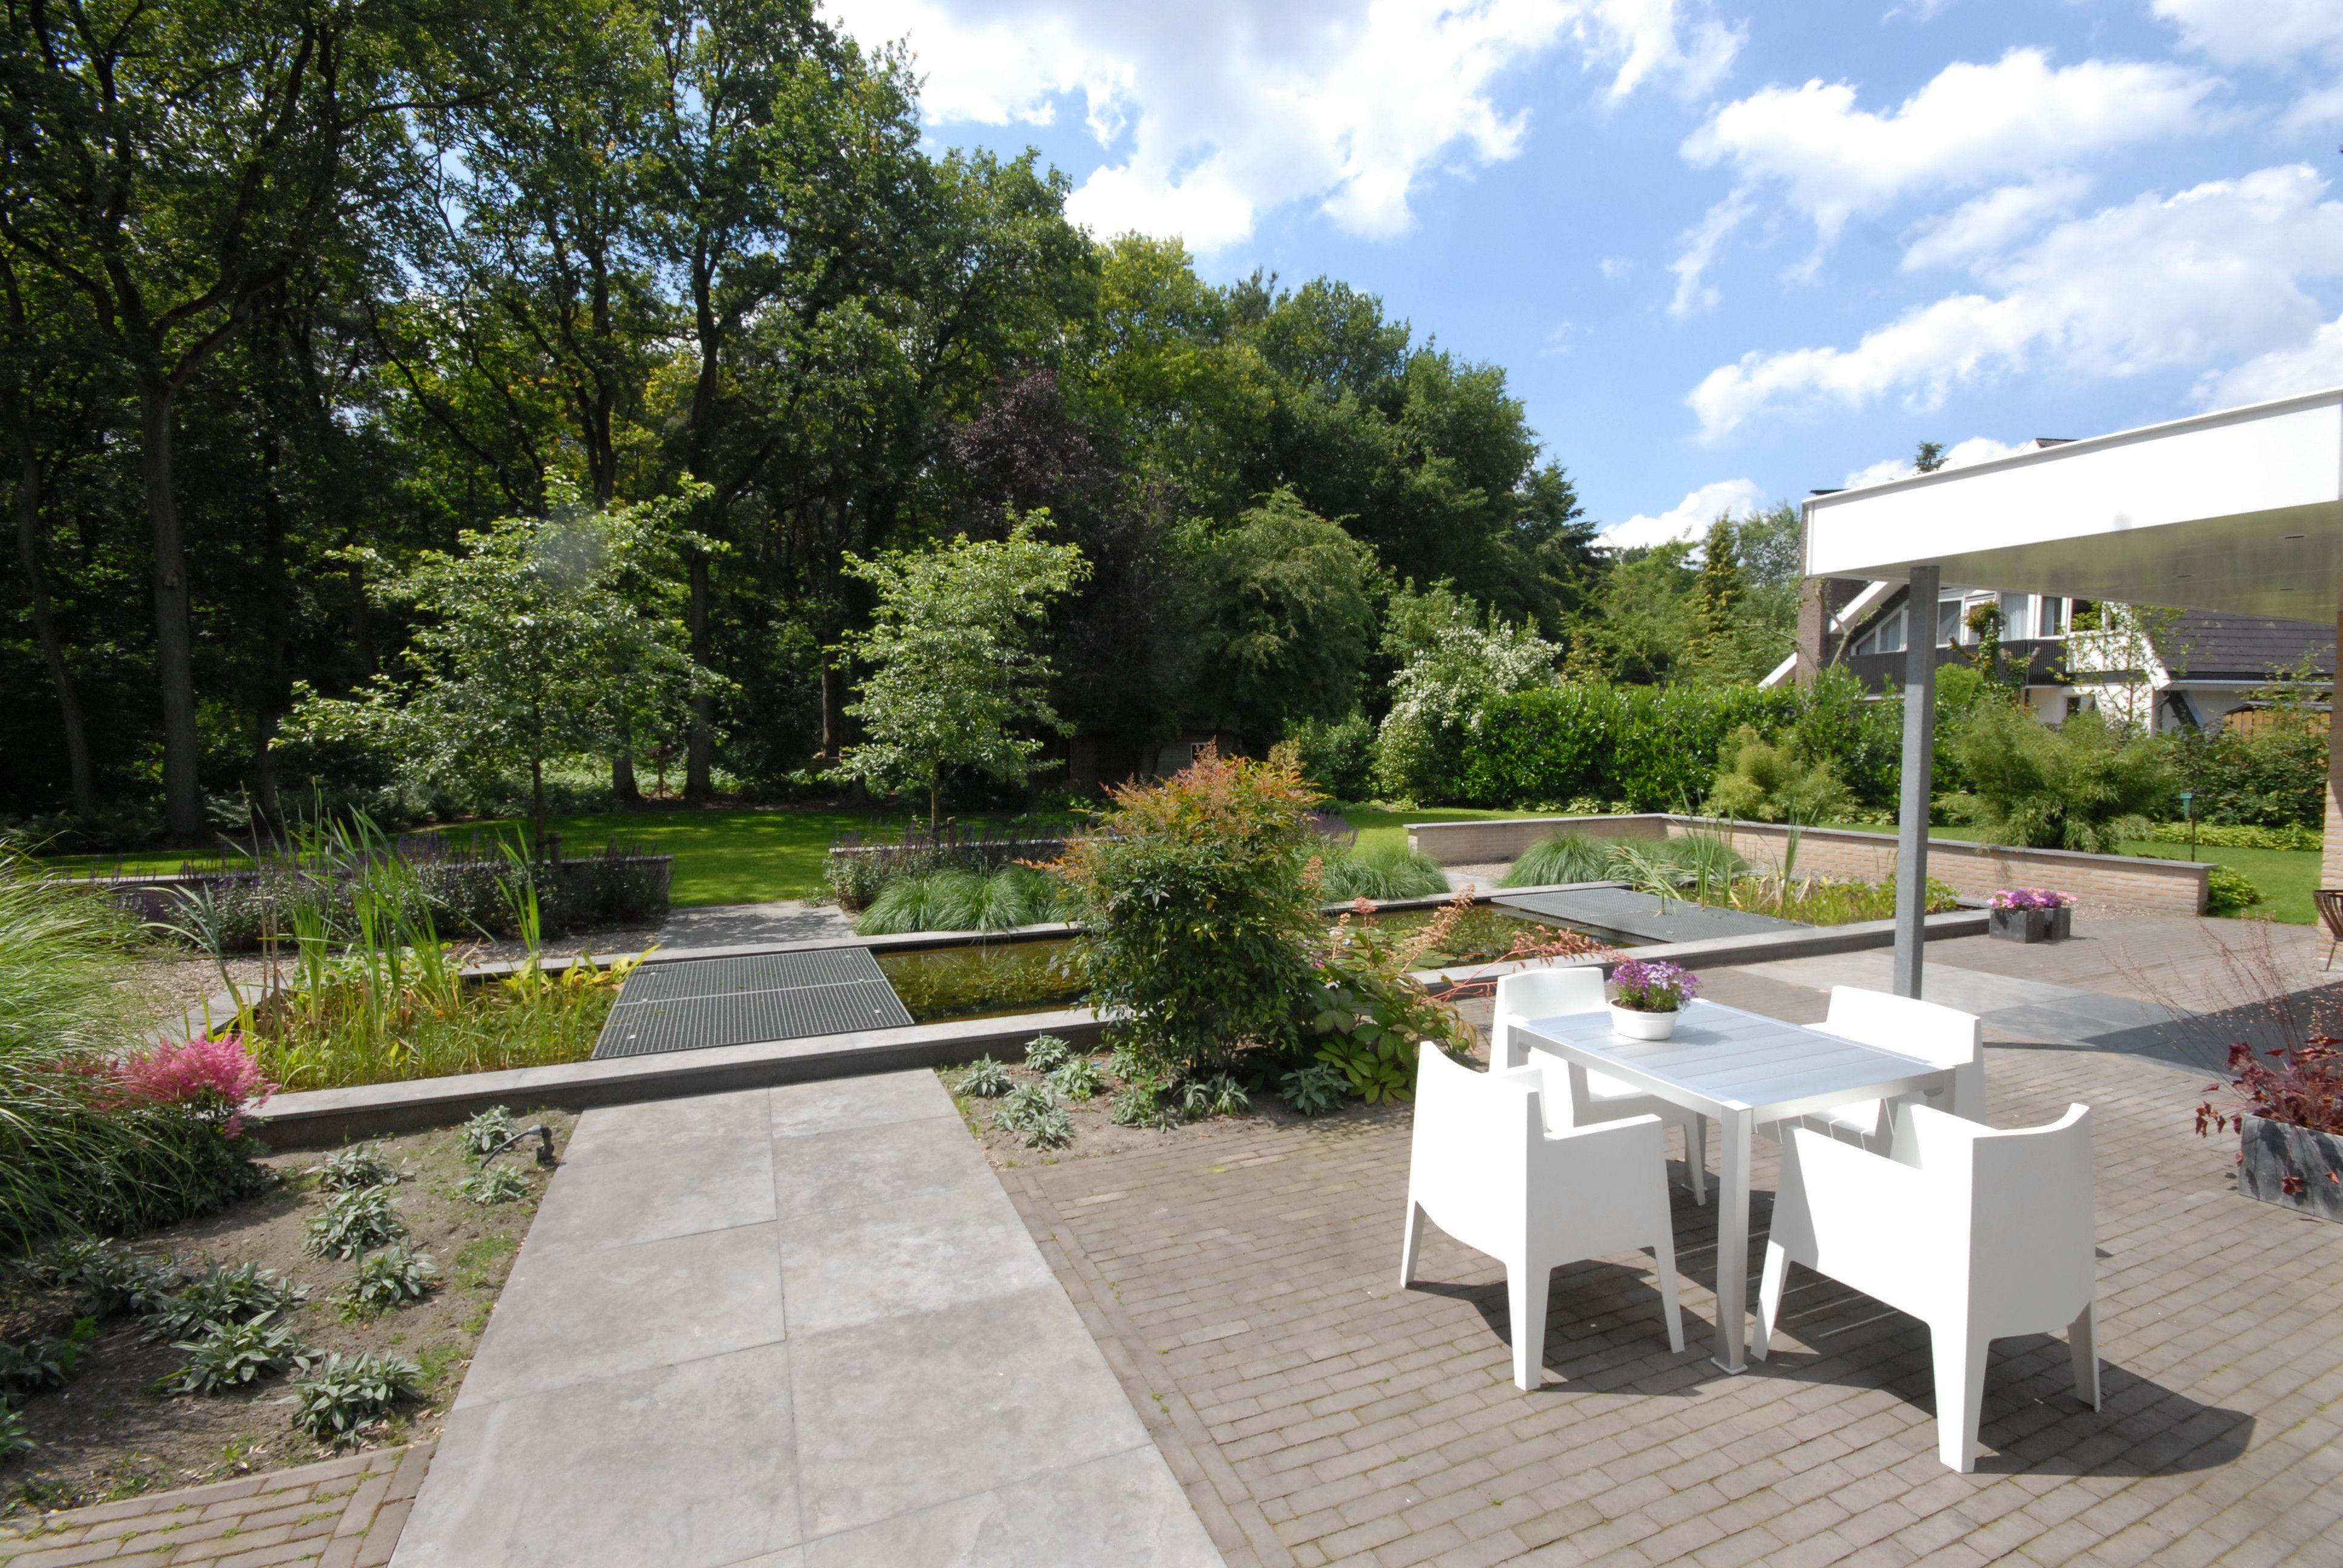 Grote tuin moderne tuin strakke lijnen zichtlijnen dakplatanen